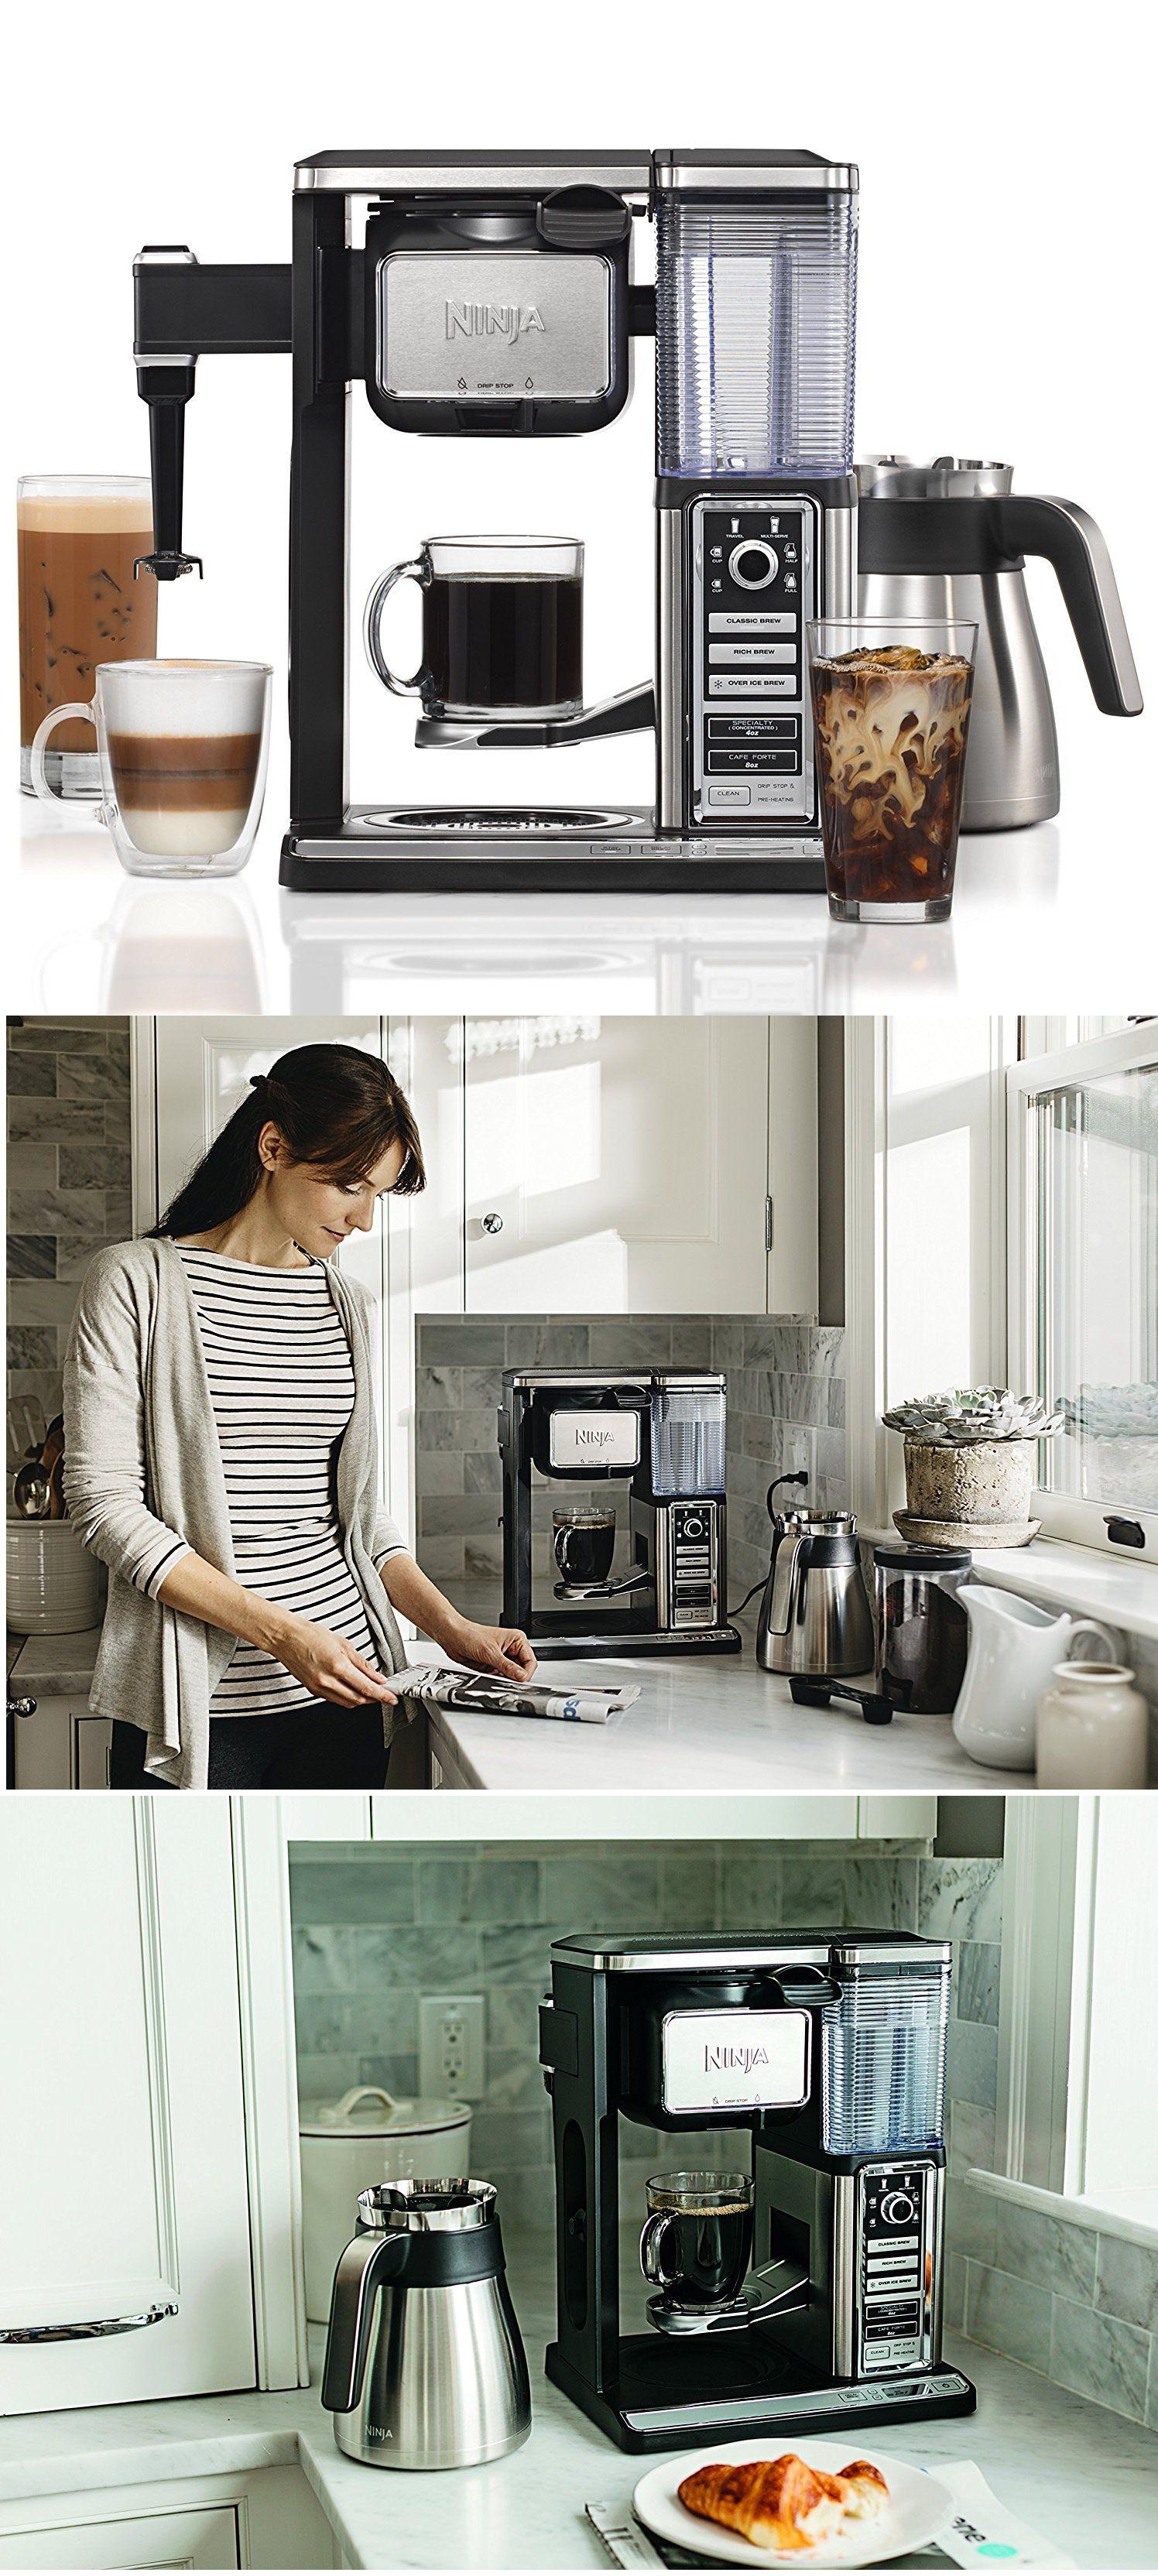 Ninja Coffee Bar Thermal Carafe System Ninja coffee